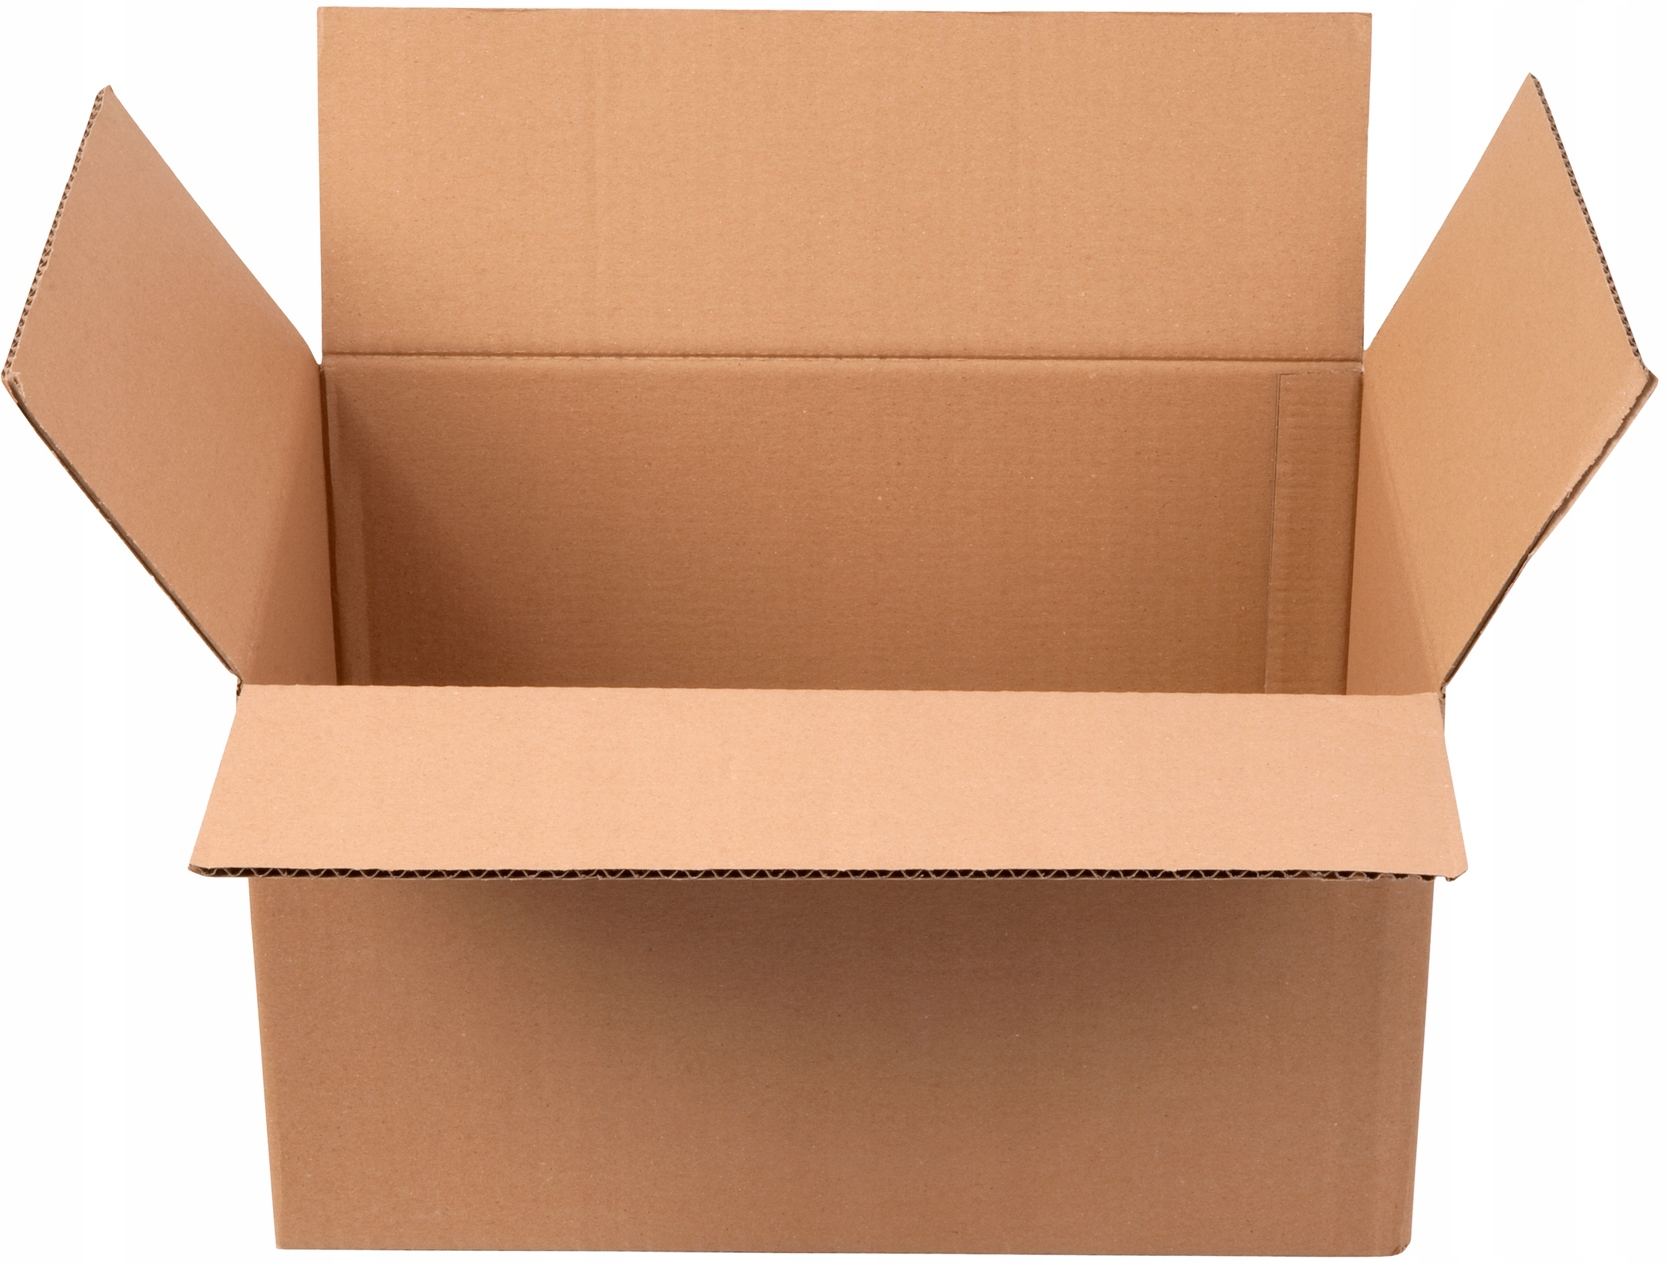 Item Cardboard BOX FOR MOVING 10 PCs 600x400x400